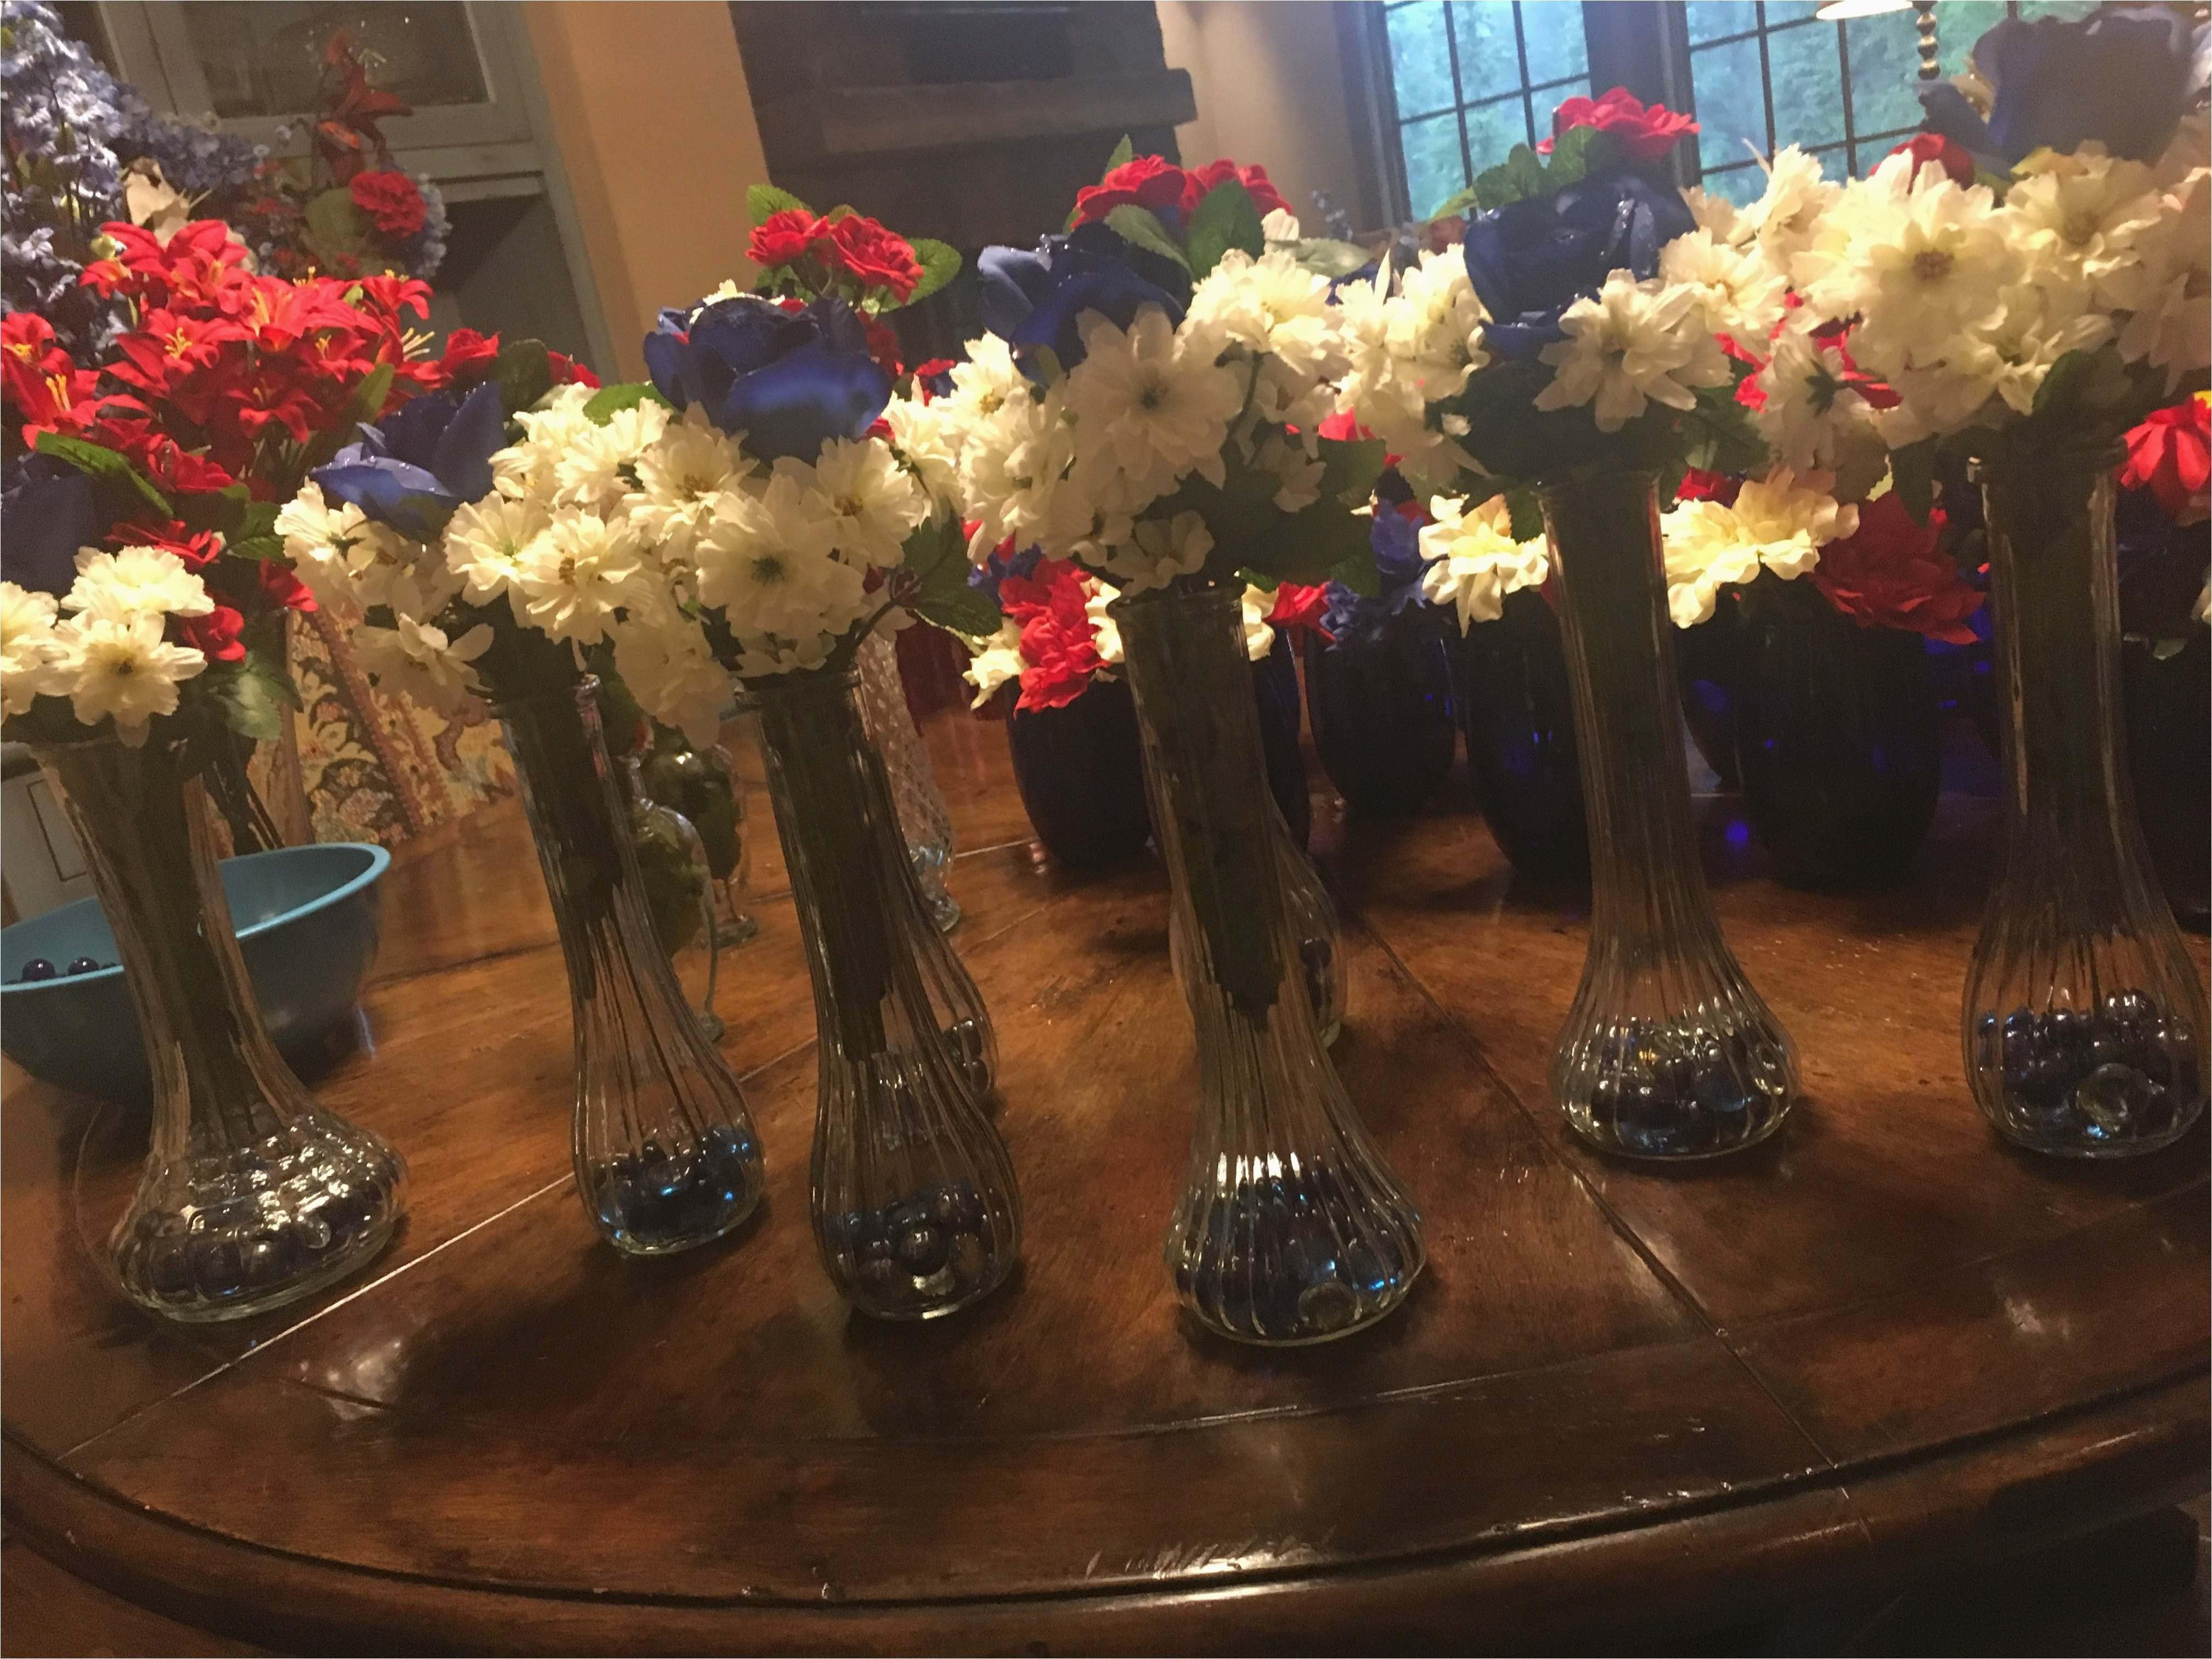 Bulk Glass Vases for Wedding Of 27 Fresh Of Christmas Vase Ideas Christmas Decor Ideas with Regard to Beautiful Diy Wedding Decor Best Dollar Tree Wedding Decorations Awesome H Vases Dollar Vase I 0d